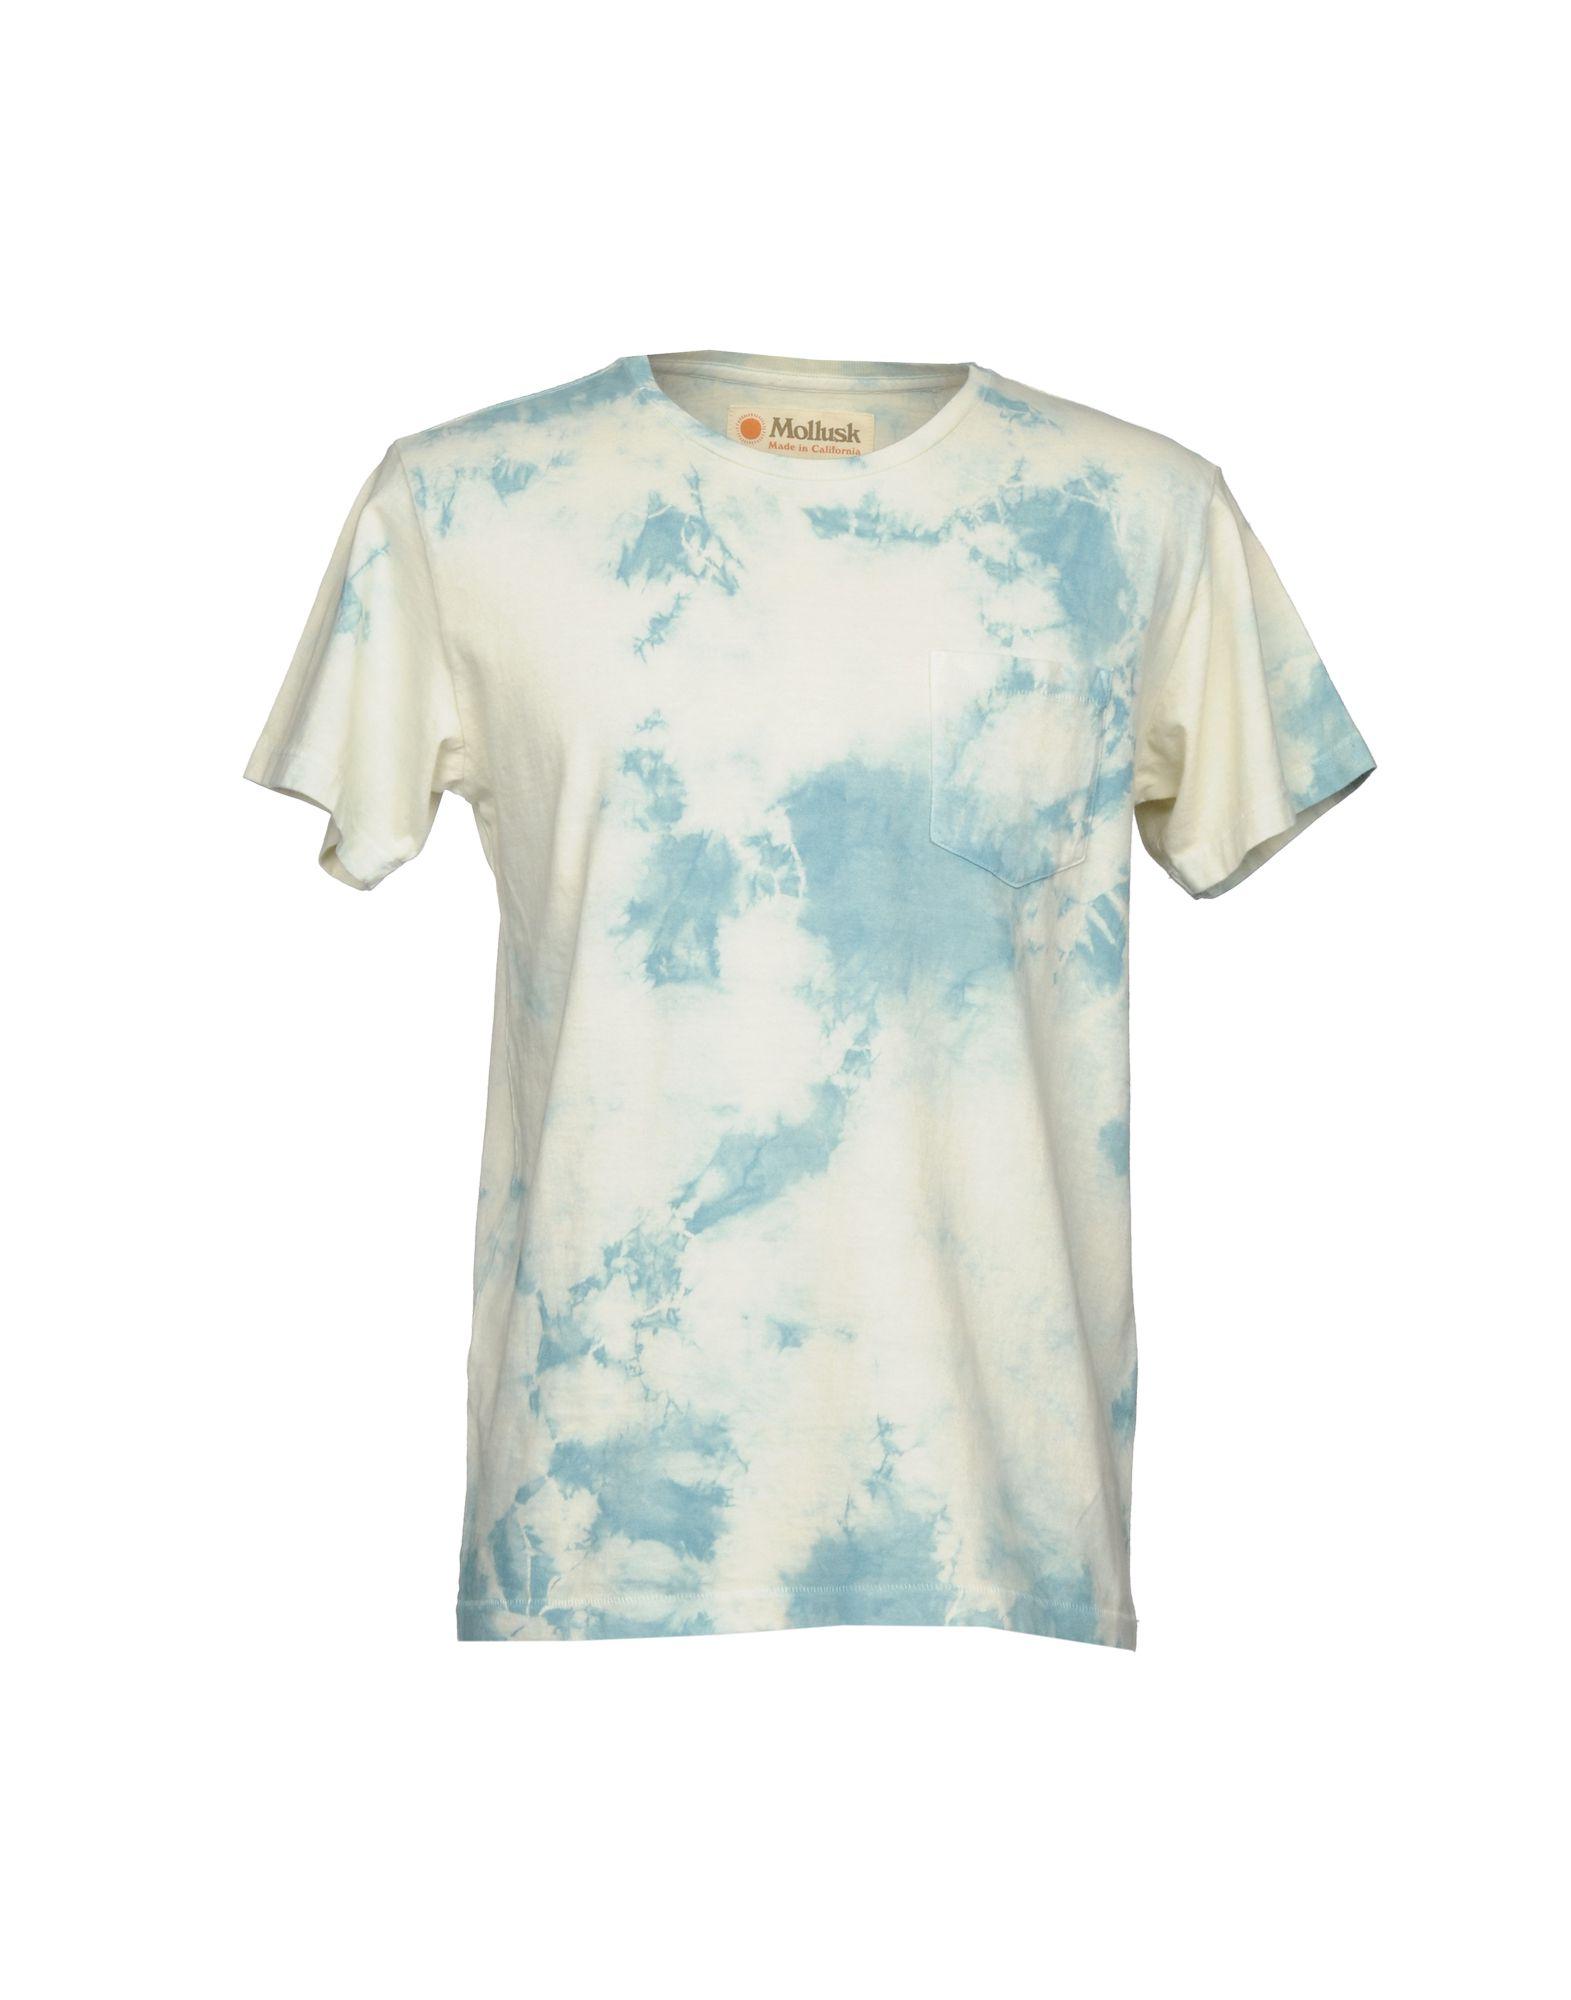 T-Shirt Mollusk uomo uomo uomo - 12135686FD ae2